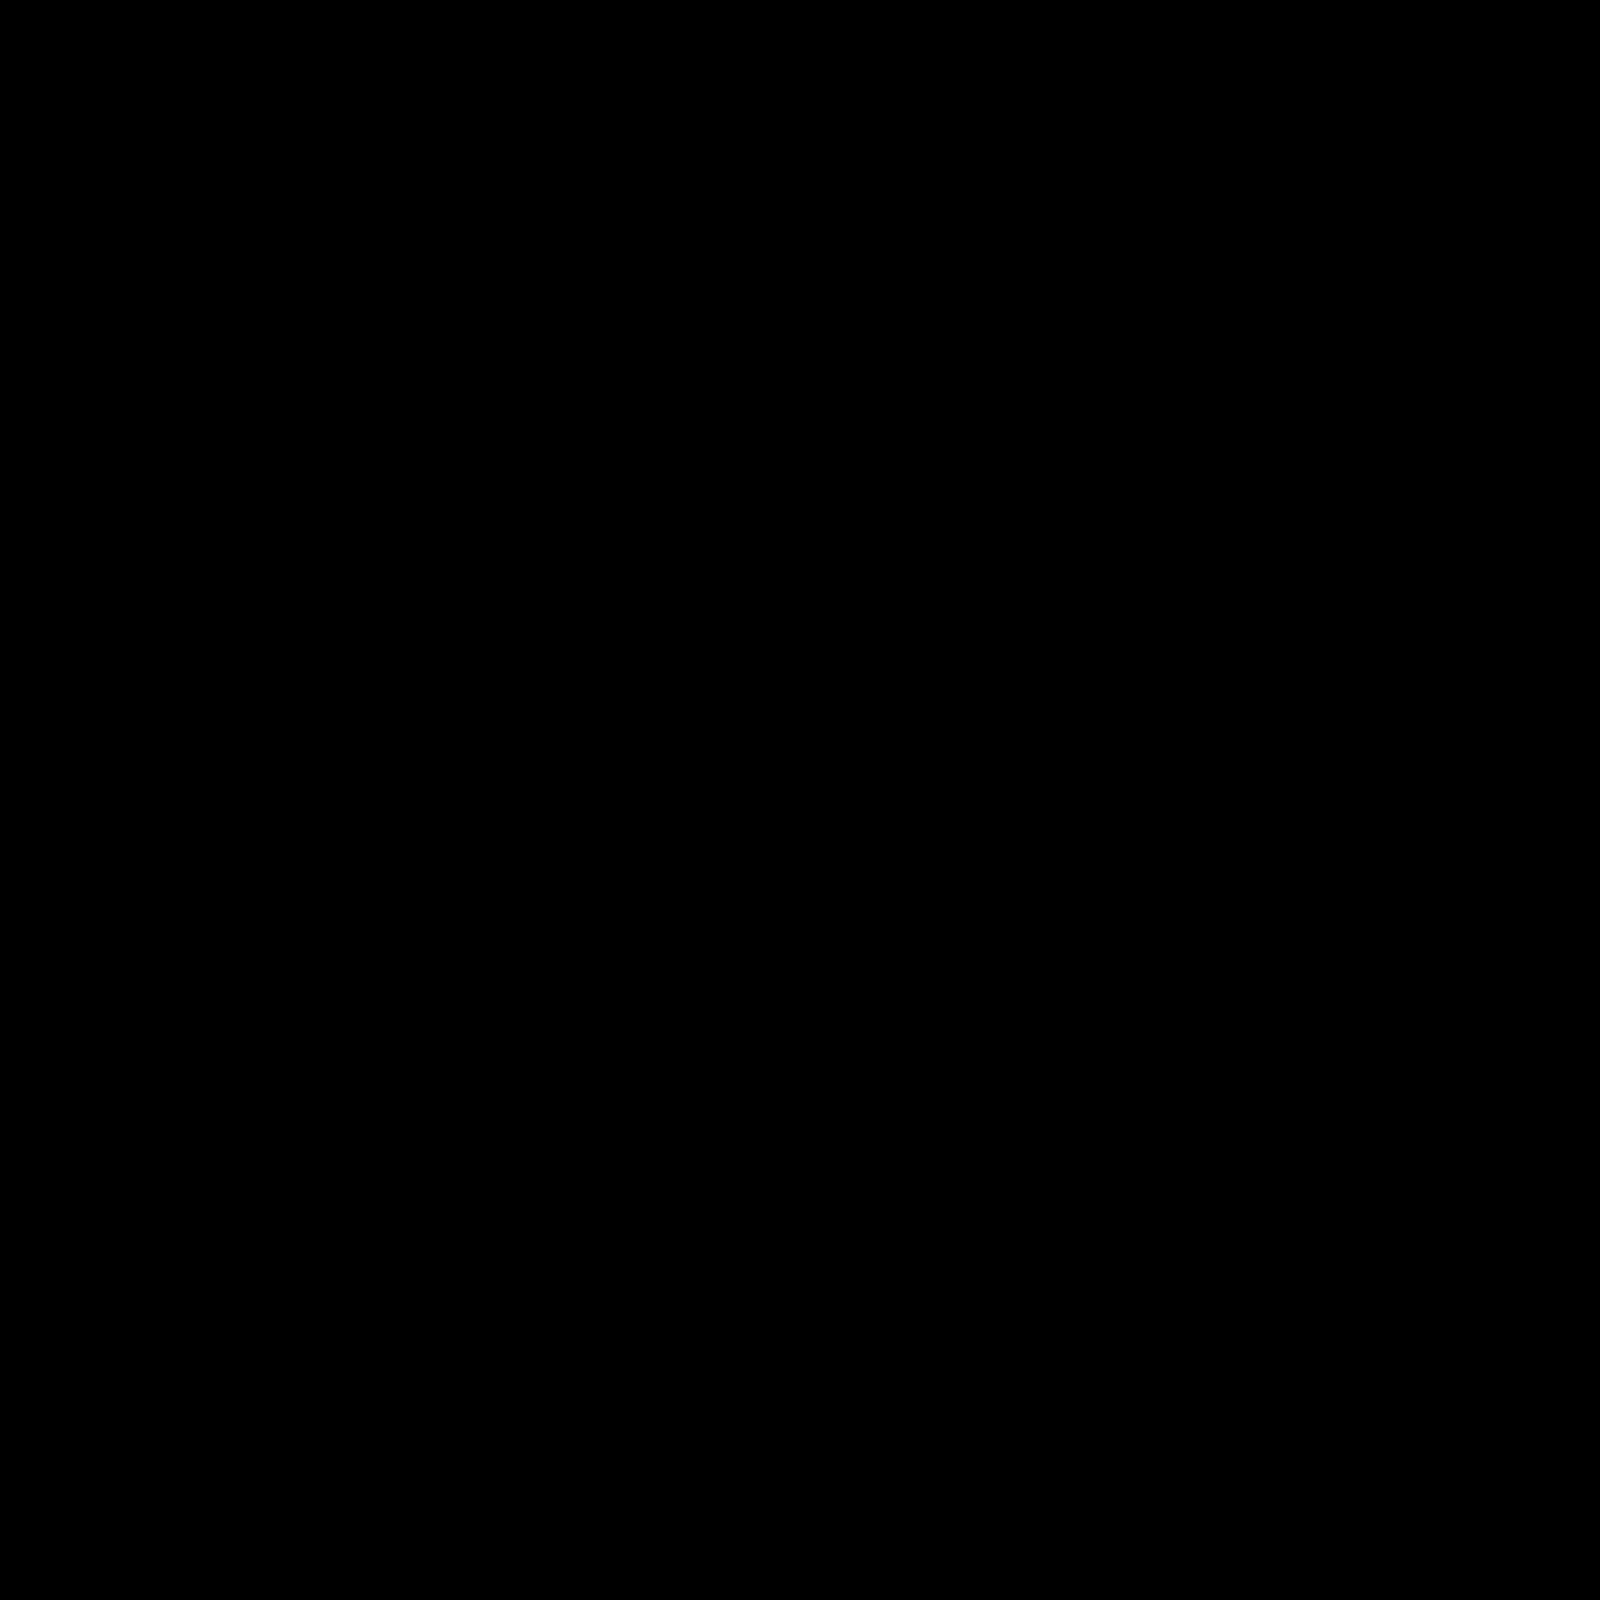 Free BSD icon